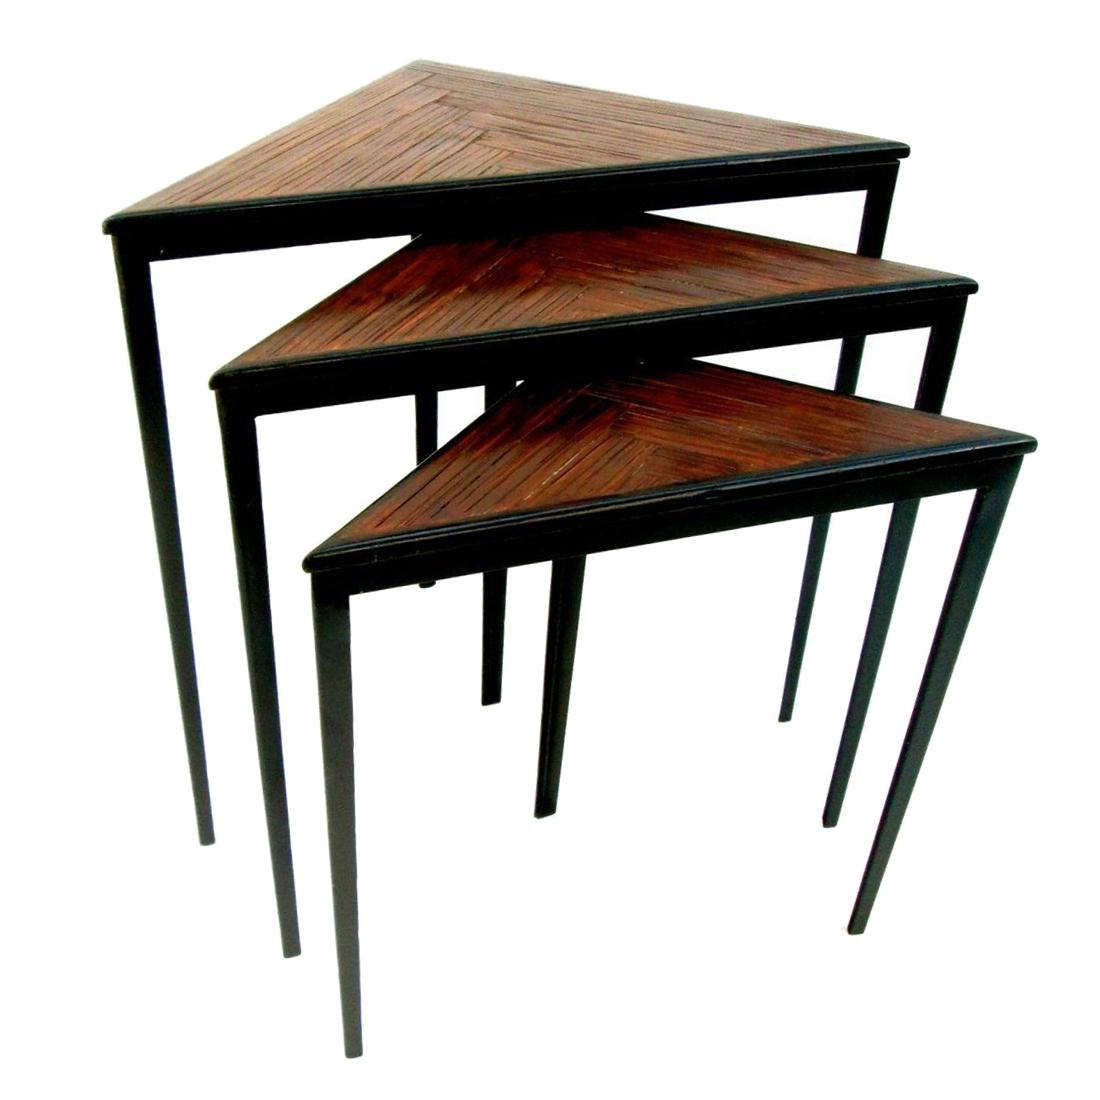 Attirant Brown Mid Century Iron U0026 Wood Triangular Nesting Tables   Set Of 3 For Sale